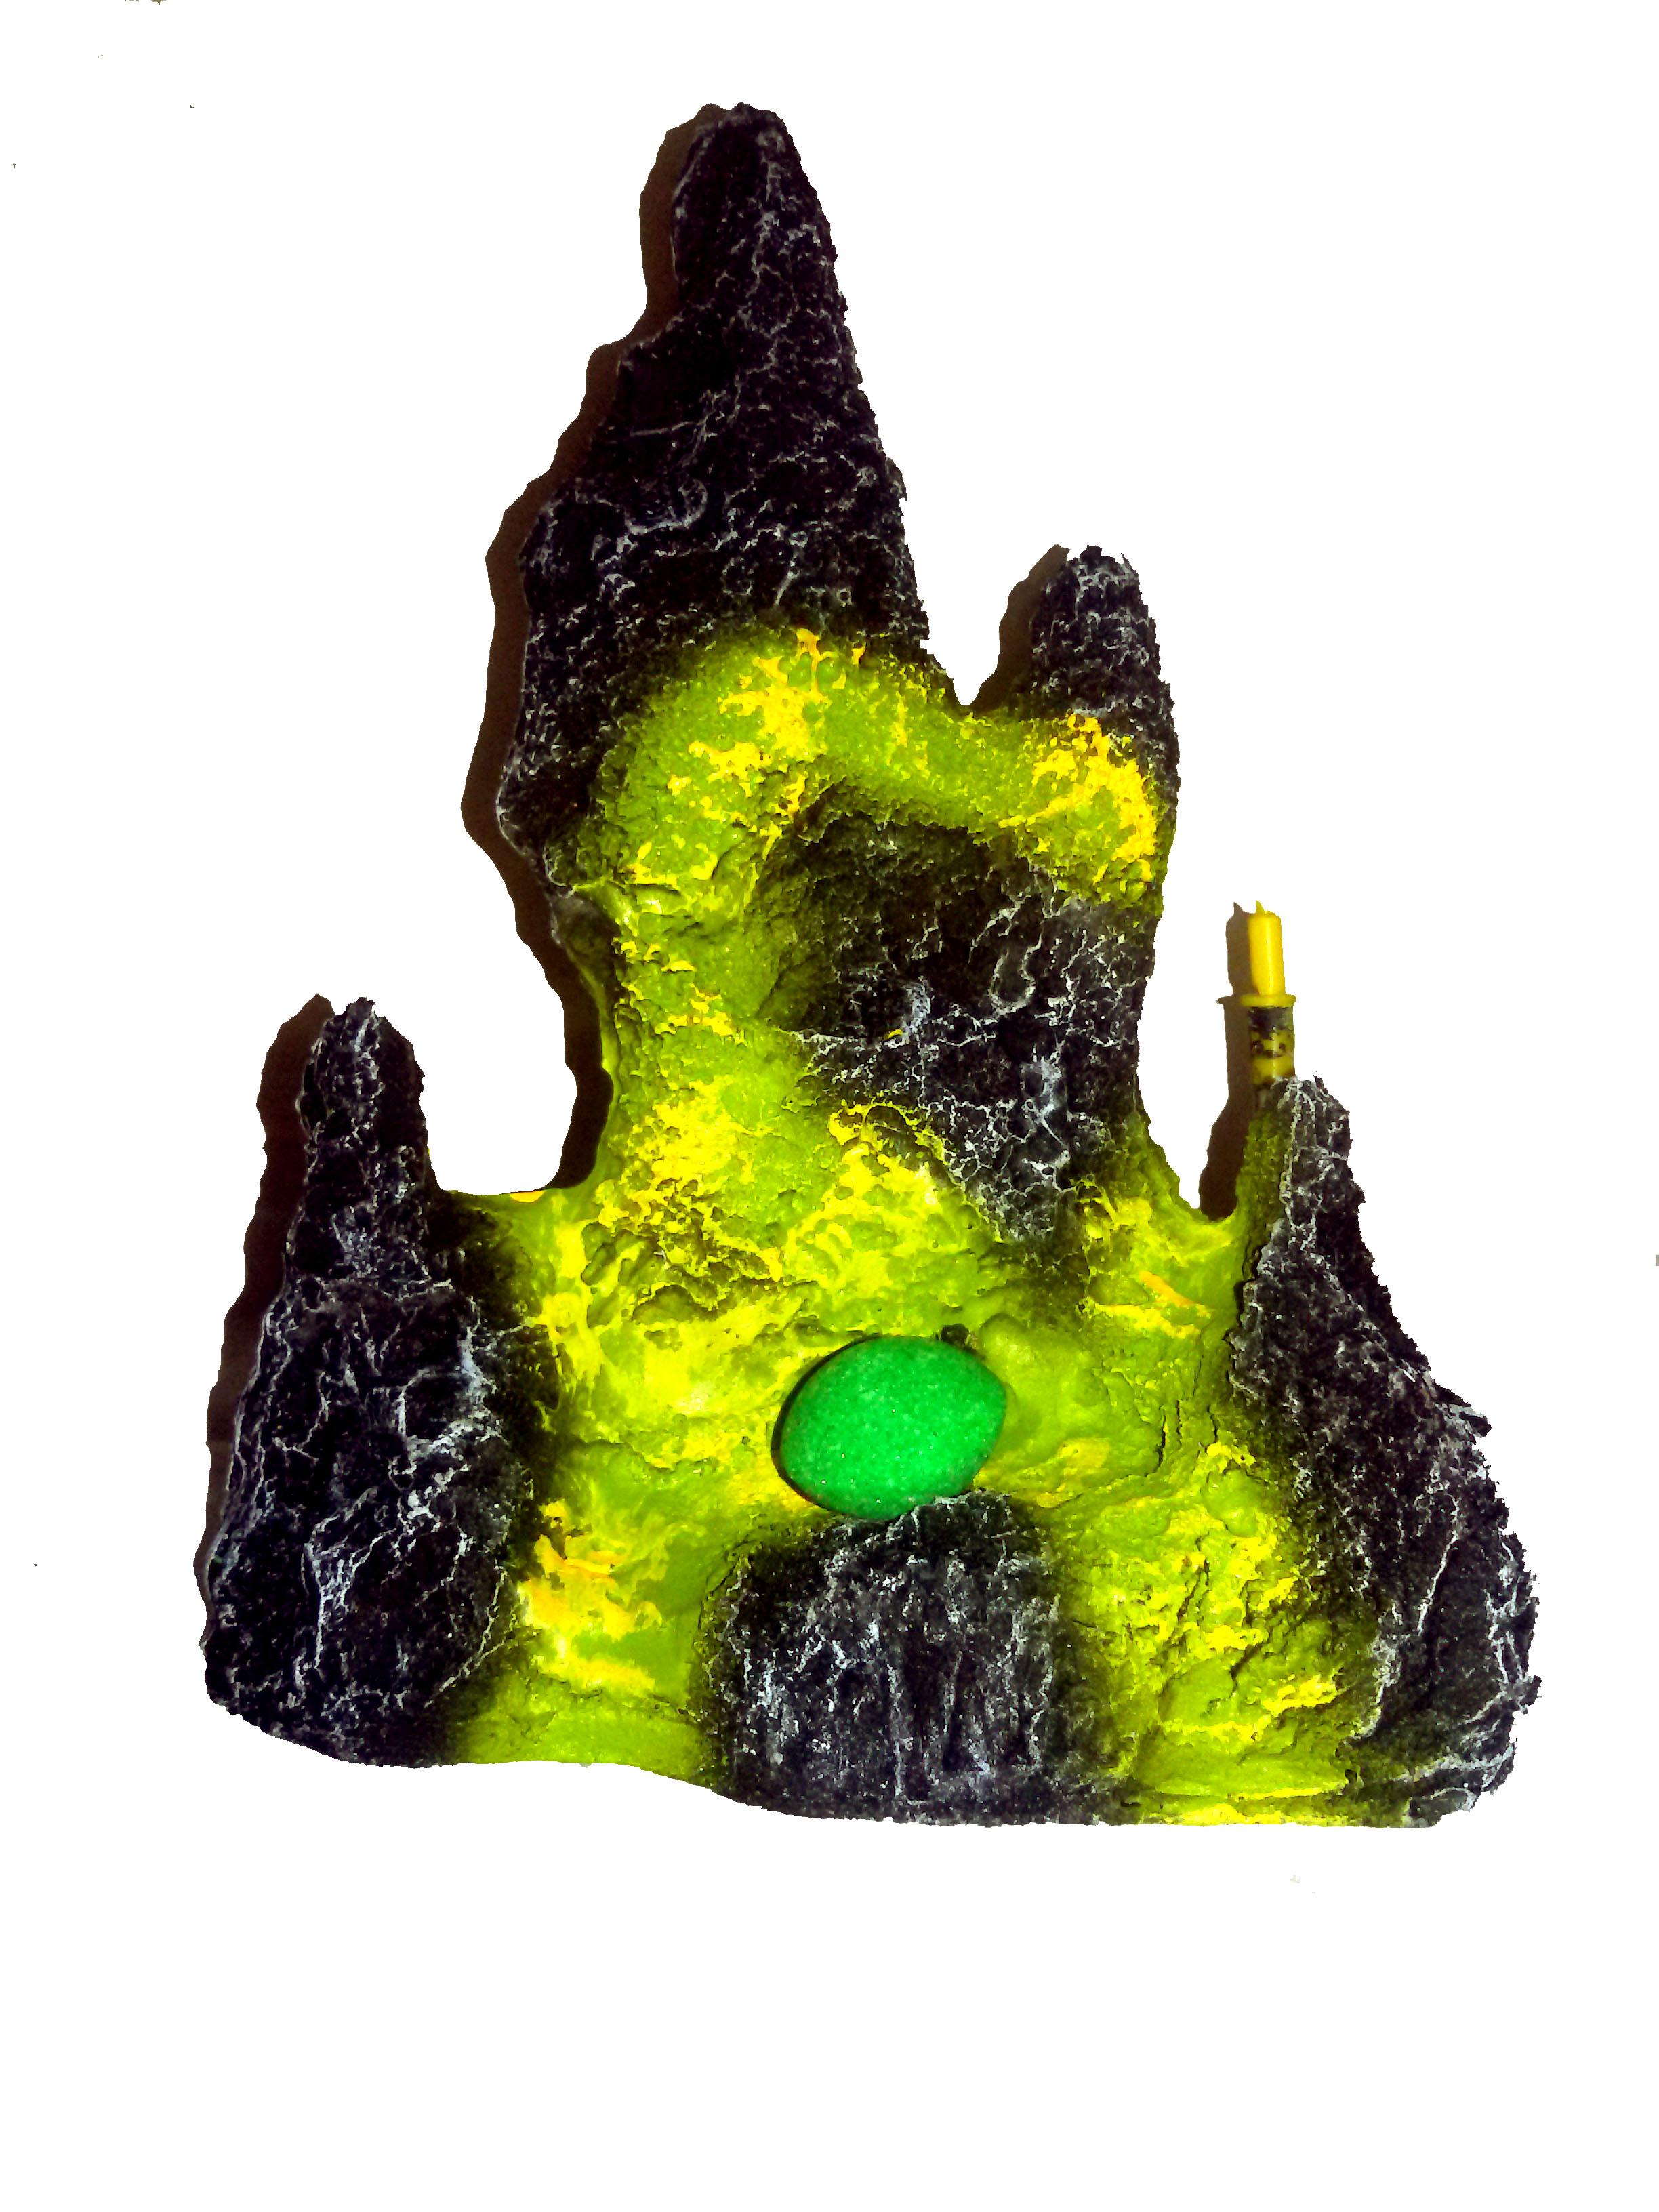 Petsplanet Aquarium Fish Tank Mountain Decorative toy - BLACK & GREEN